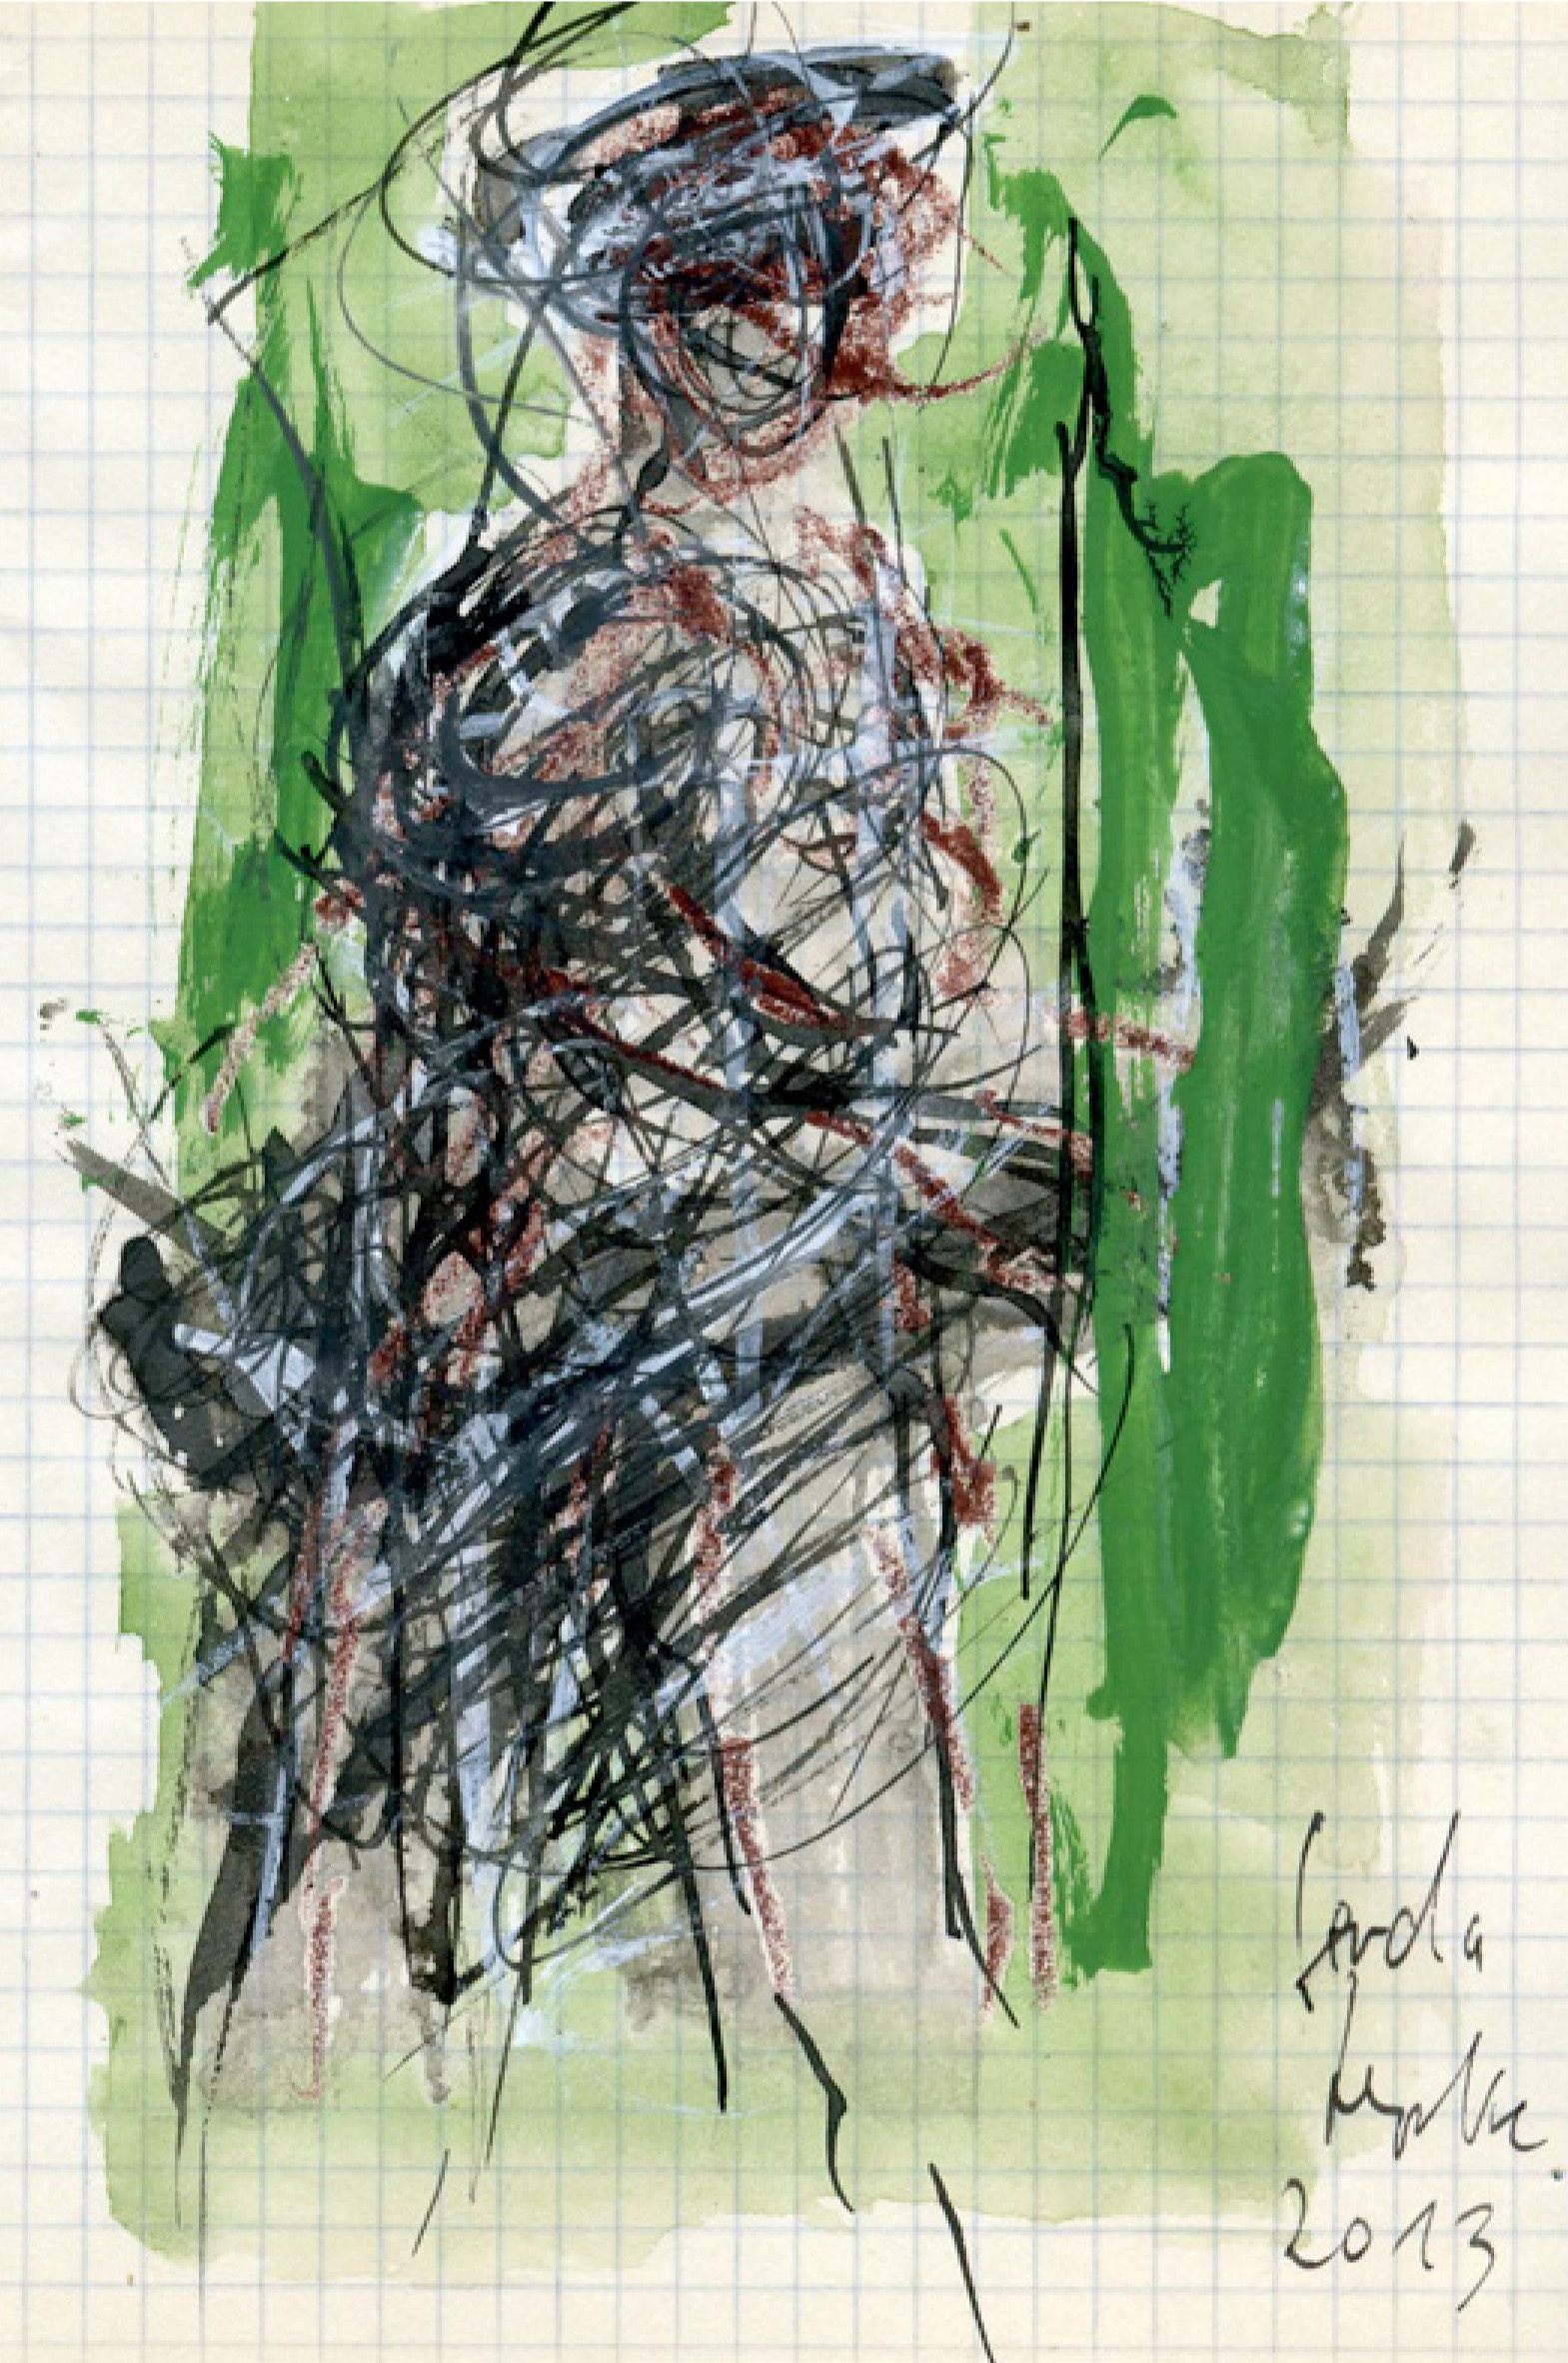 24 | Gerda Lepke | Skizzenblatt | 2013 | Aquarell/Tusche auf Rechenpapier | 20,3 x 14,5 cm | Kunstlotterie